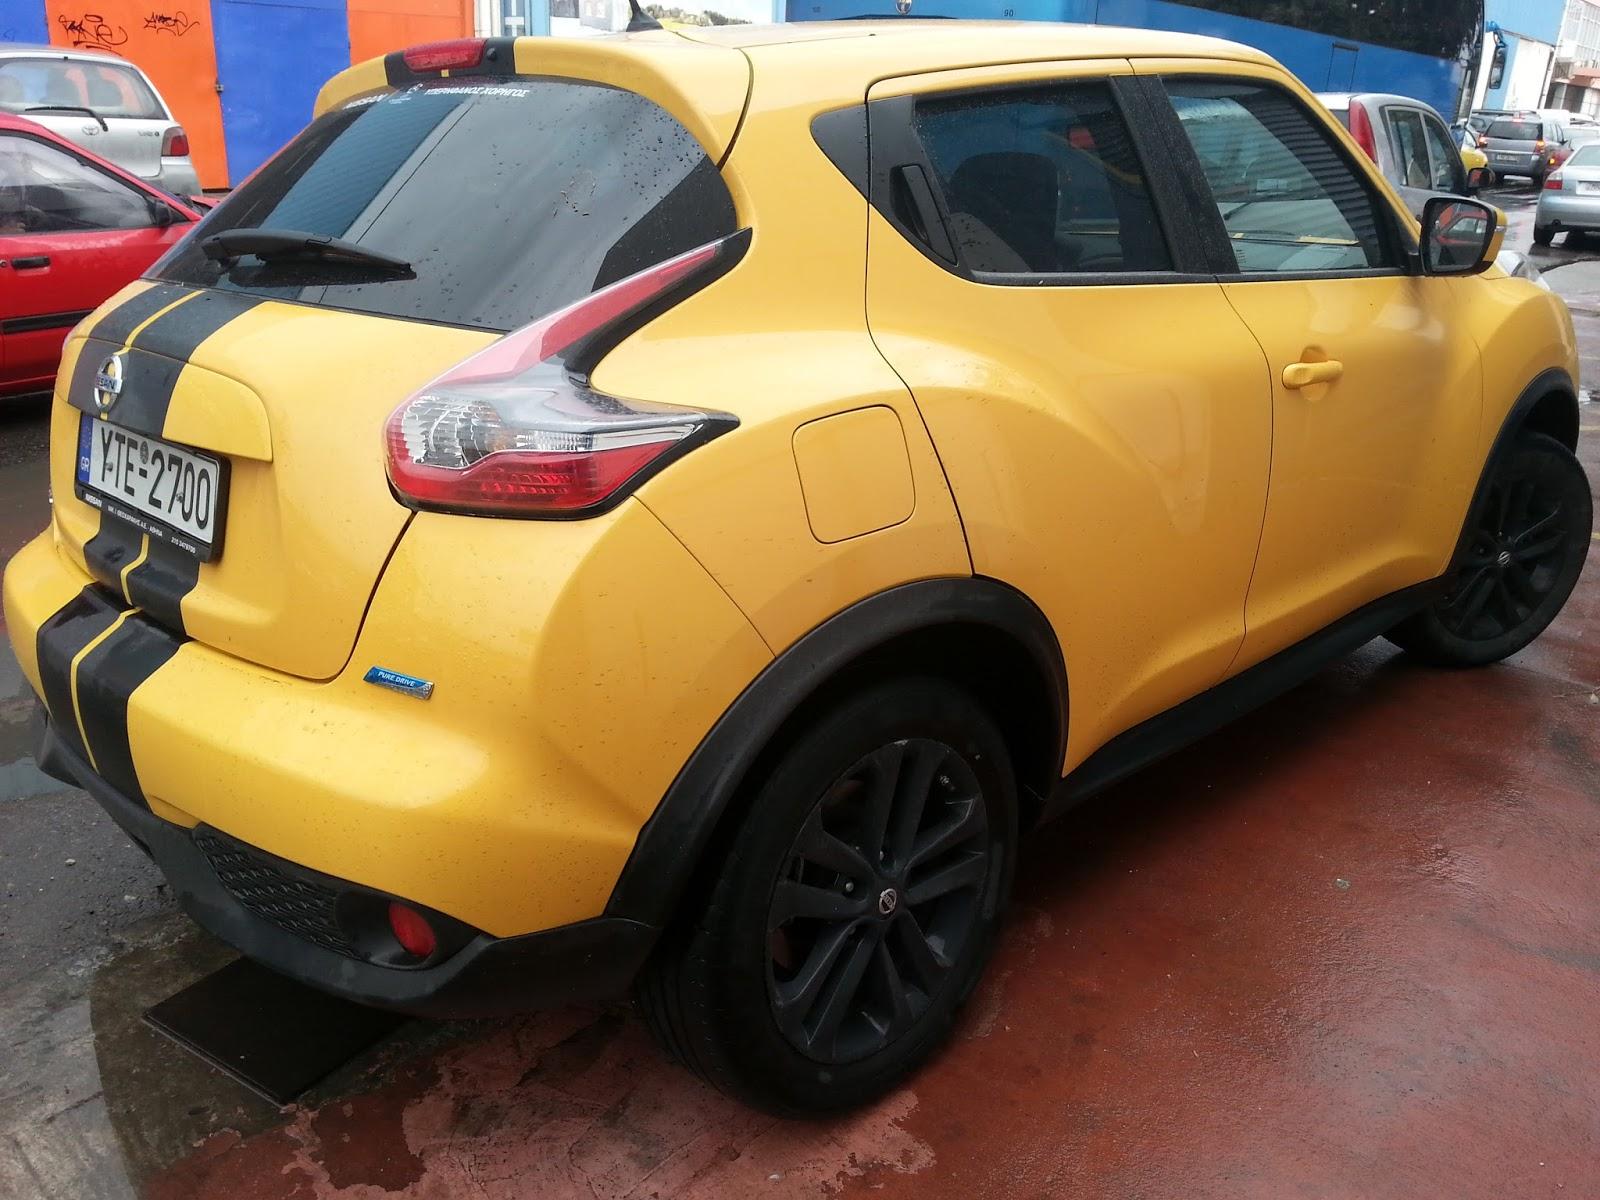 f2 Κι όμως, ένα Nissan Juke μπορεί να σου φτιάξει τη μέρα Diesel, Nissan, Nissan Juke, TEST, ΔΟΚΙΜΕΣ, οδηγούμε